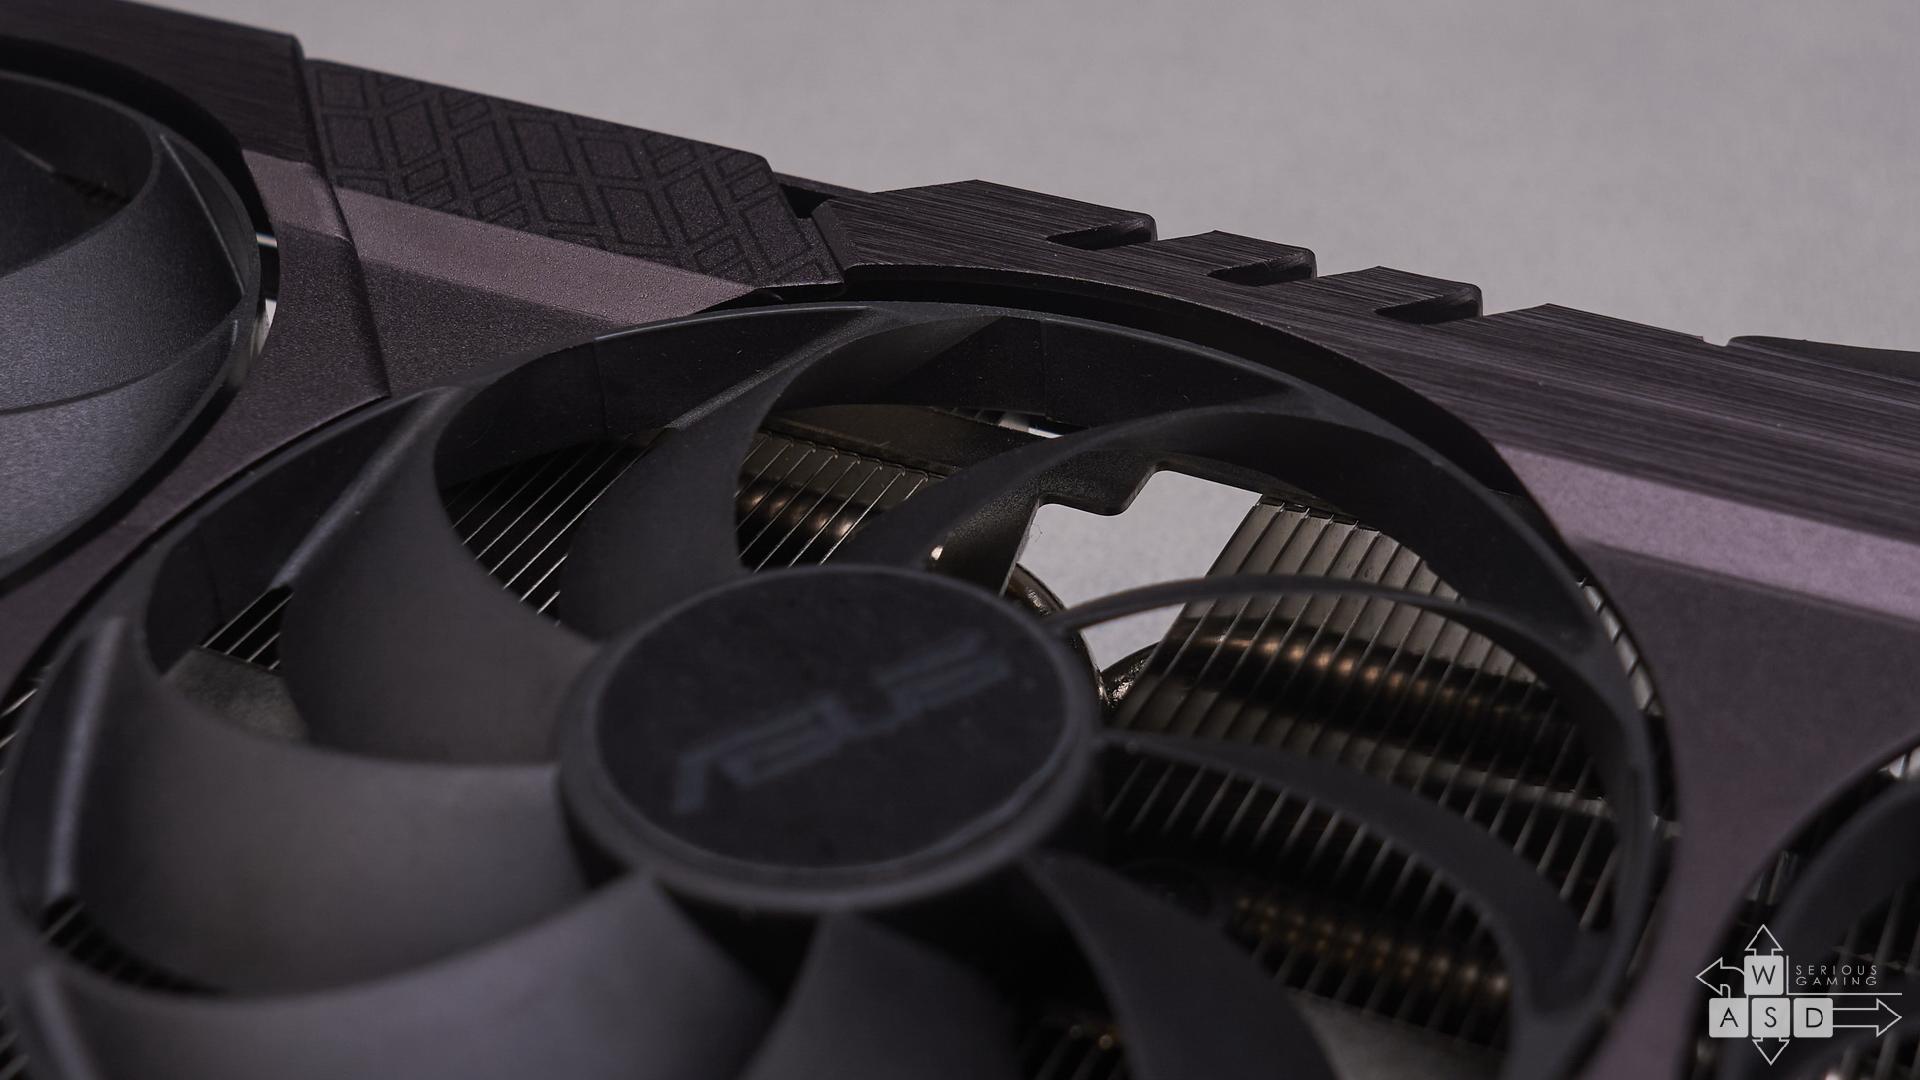 ASUS TUF RTX 3070 Gaming OC 8GB review | WASD